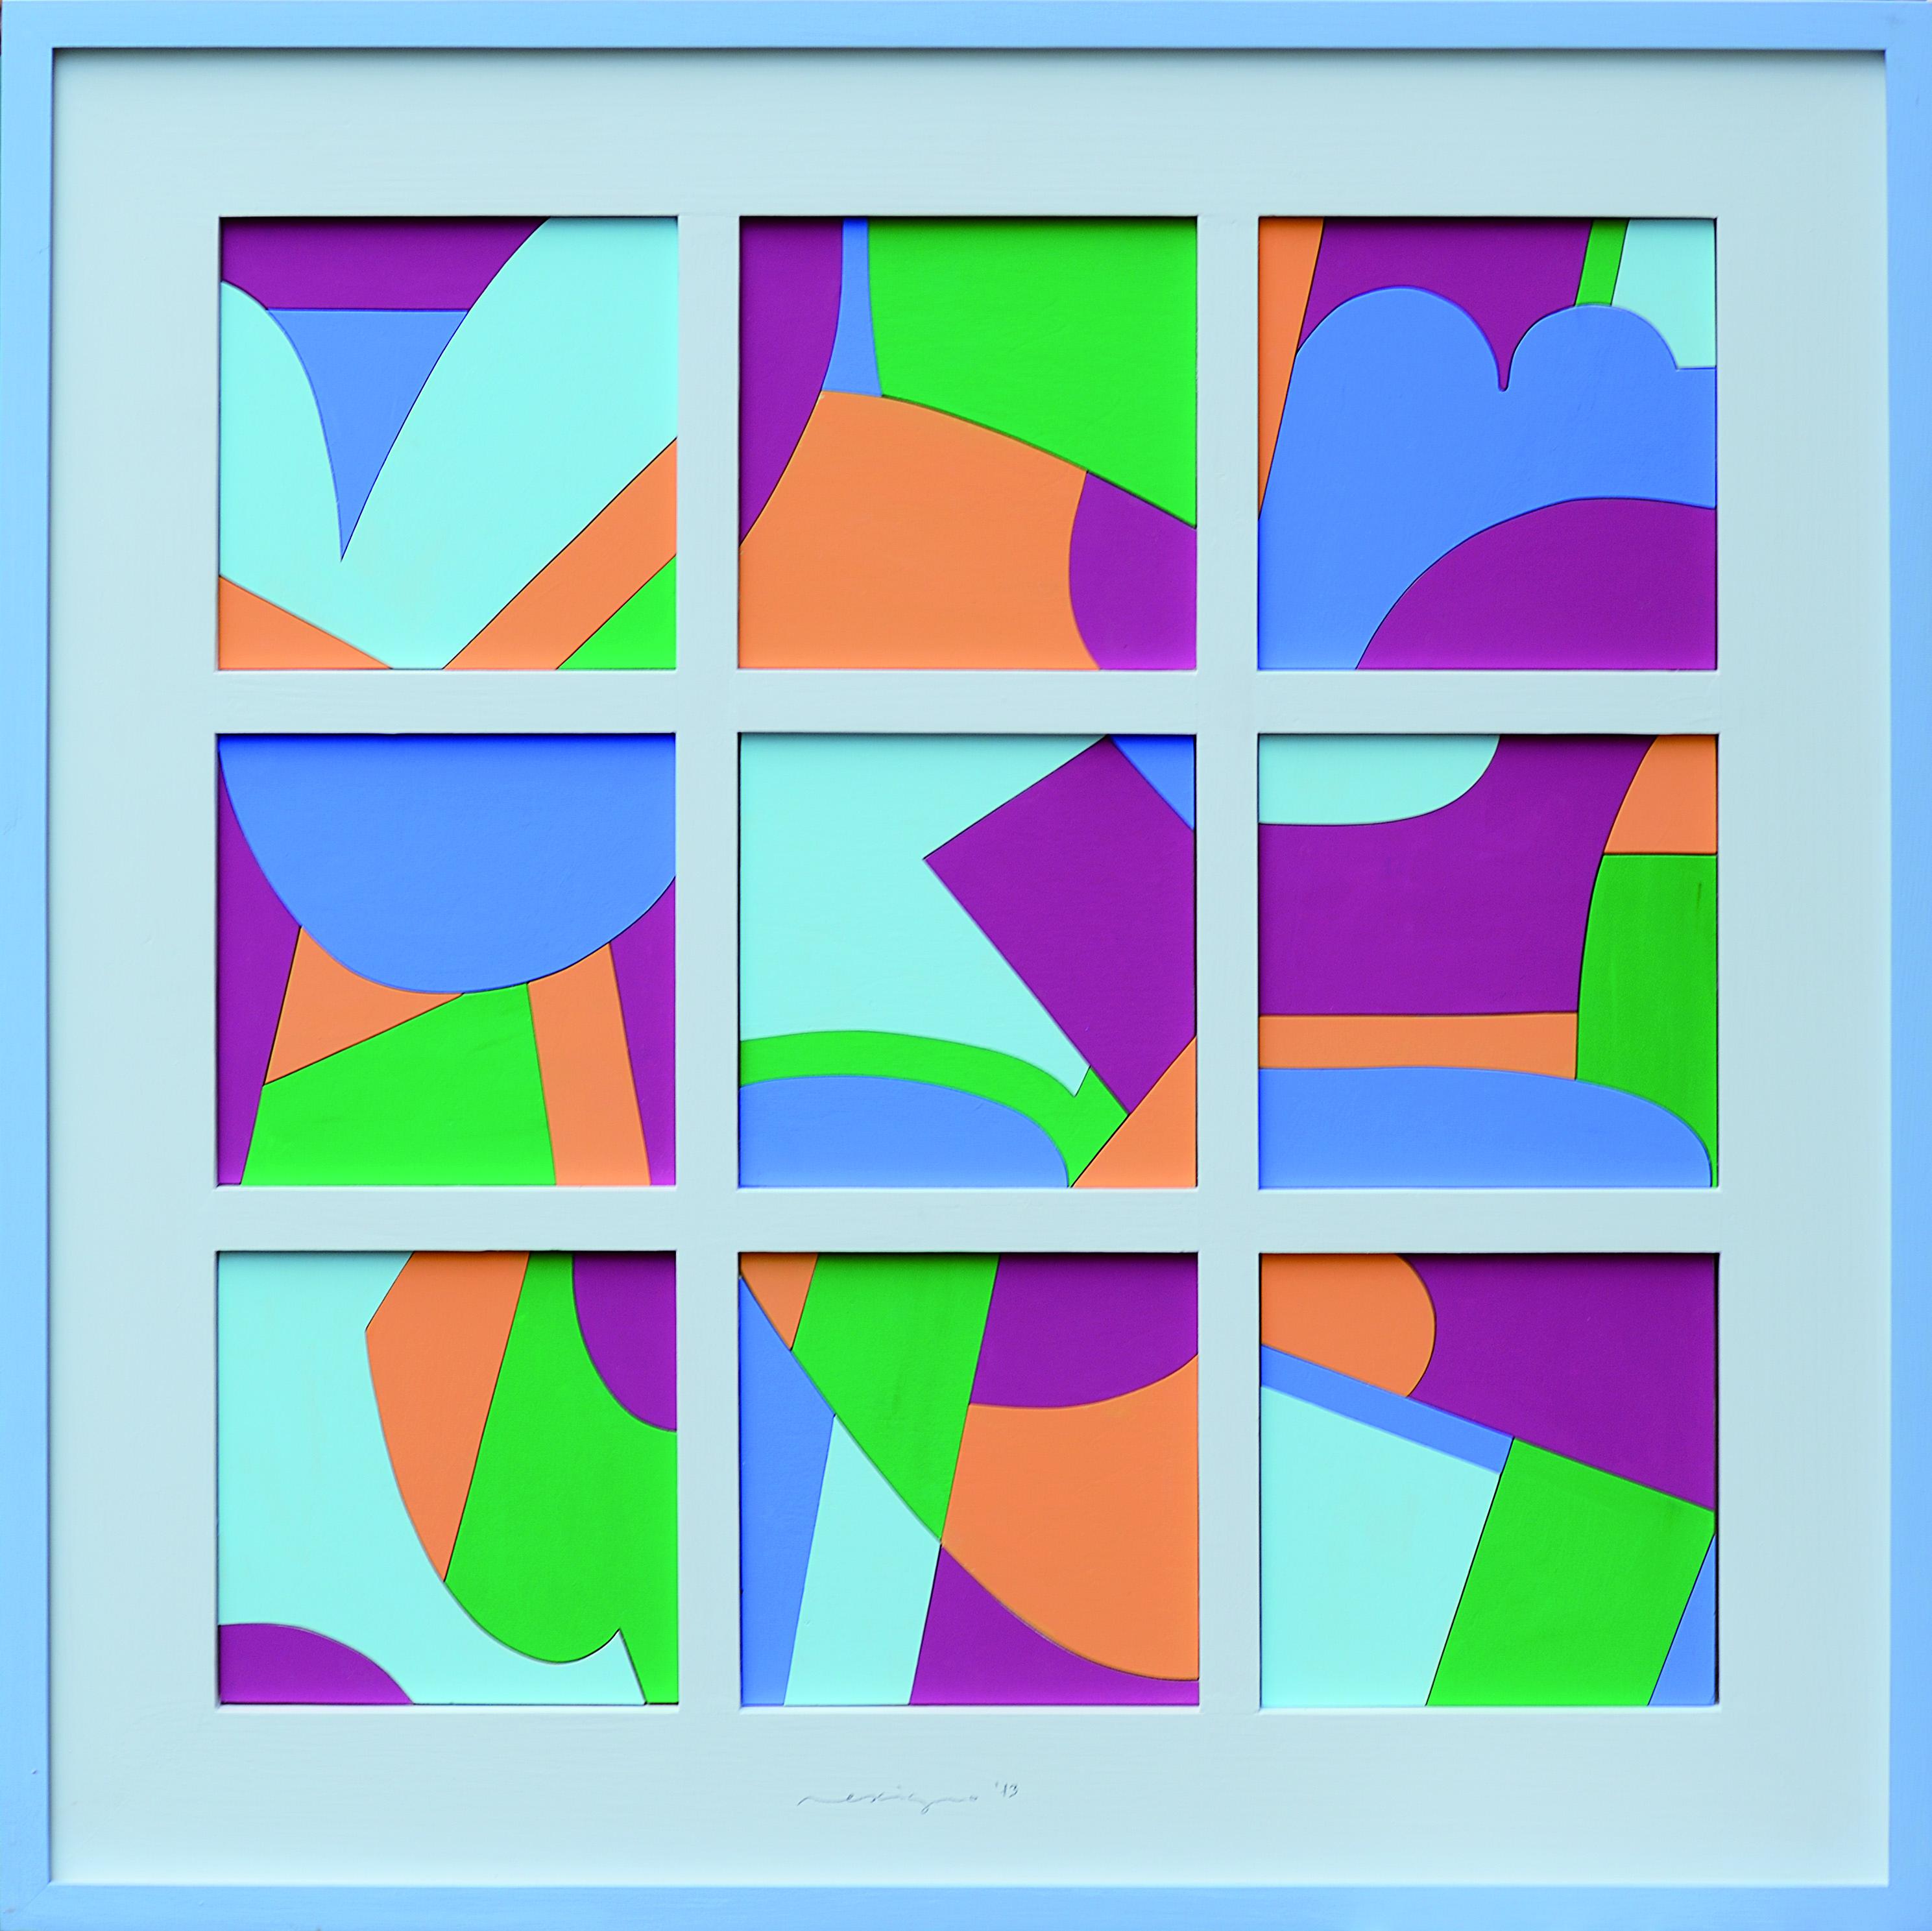 Impressioni futuriste 1, 2012